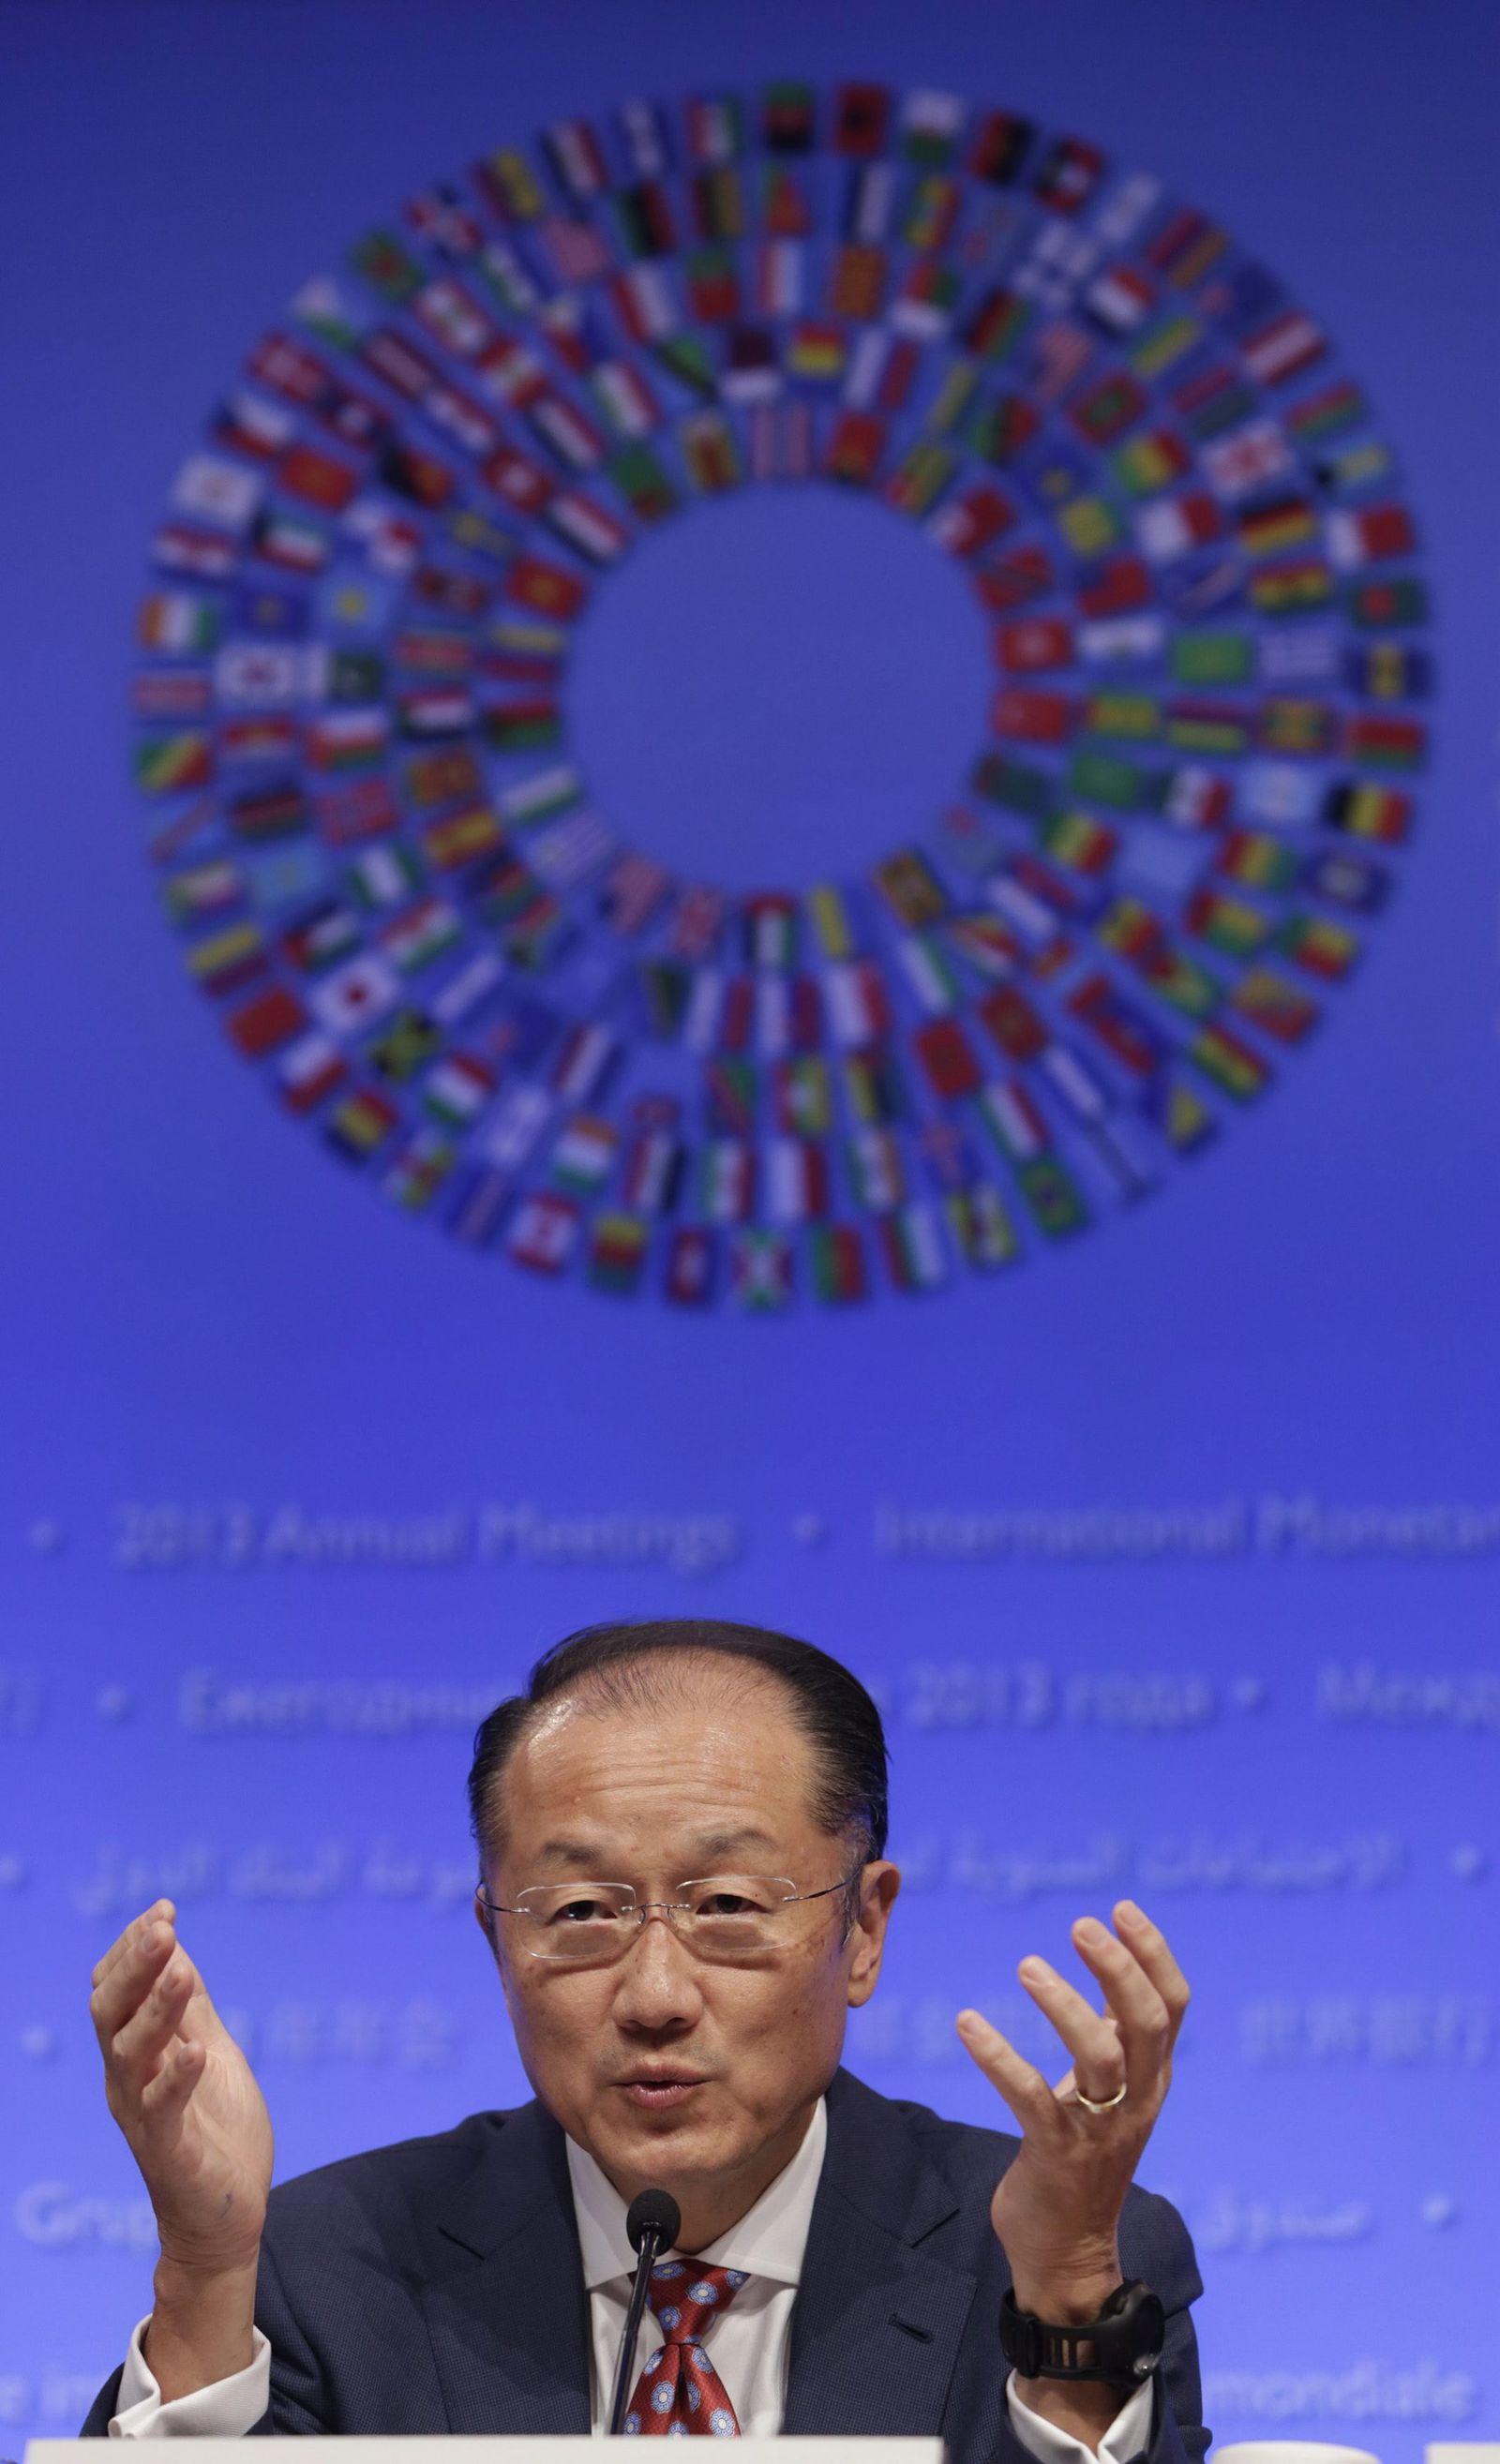 IMF World Bank Annual Meetings 2013